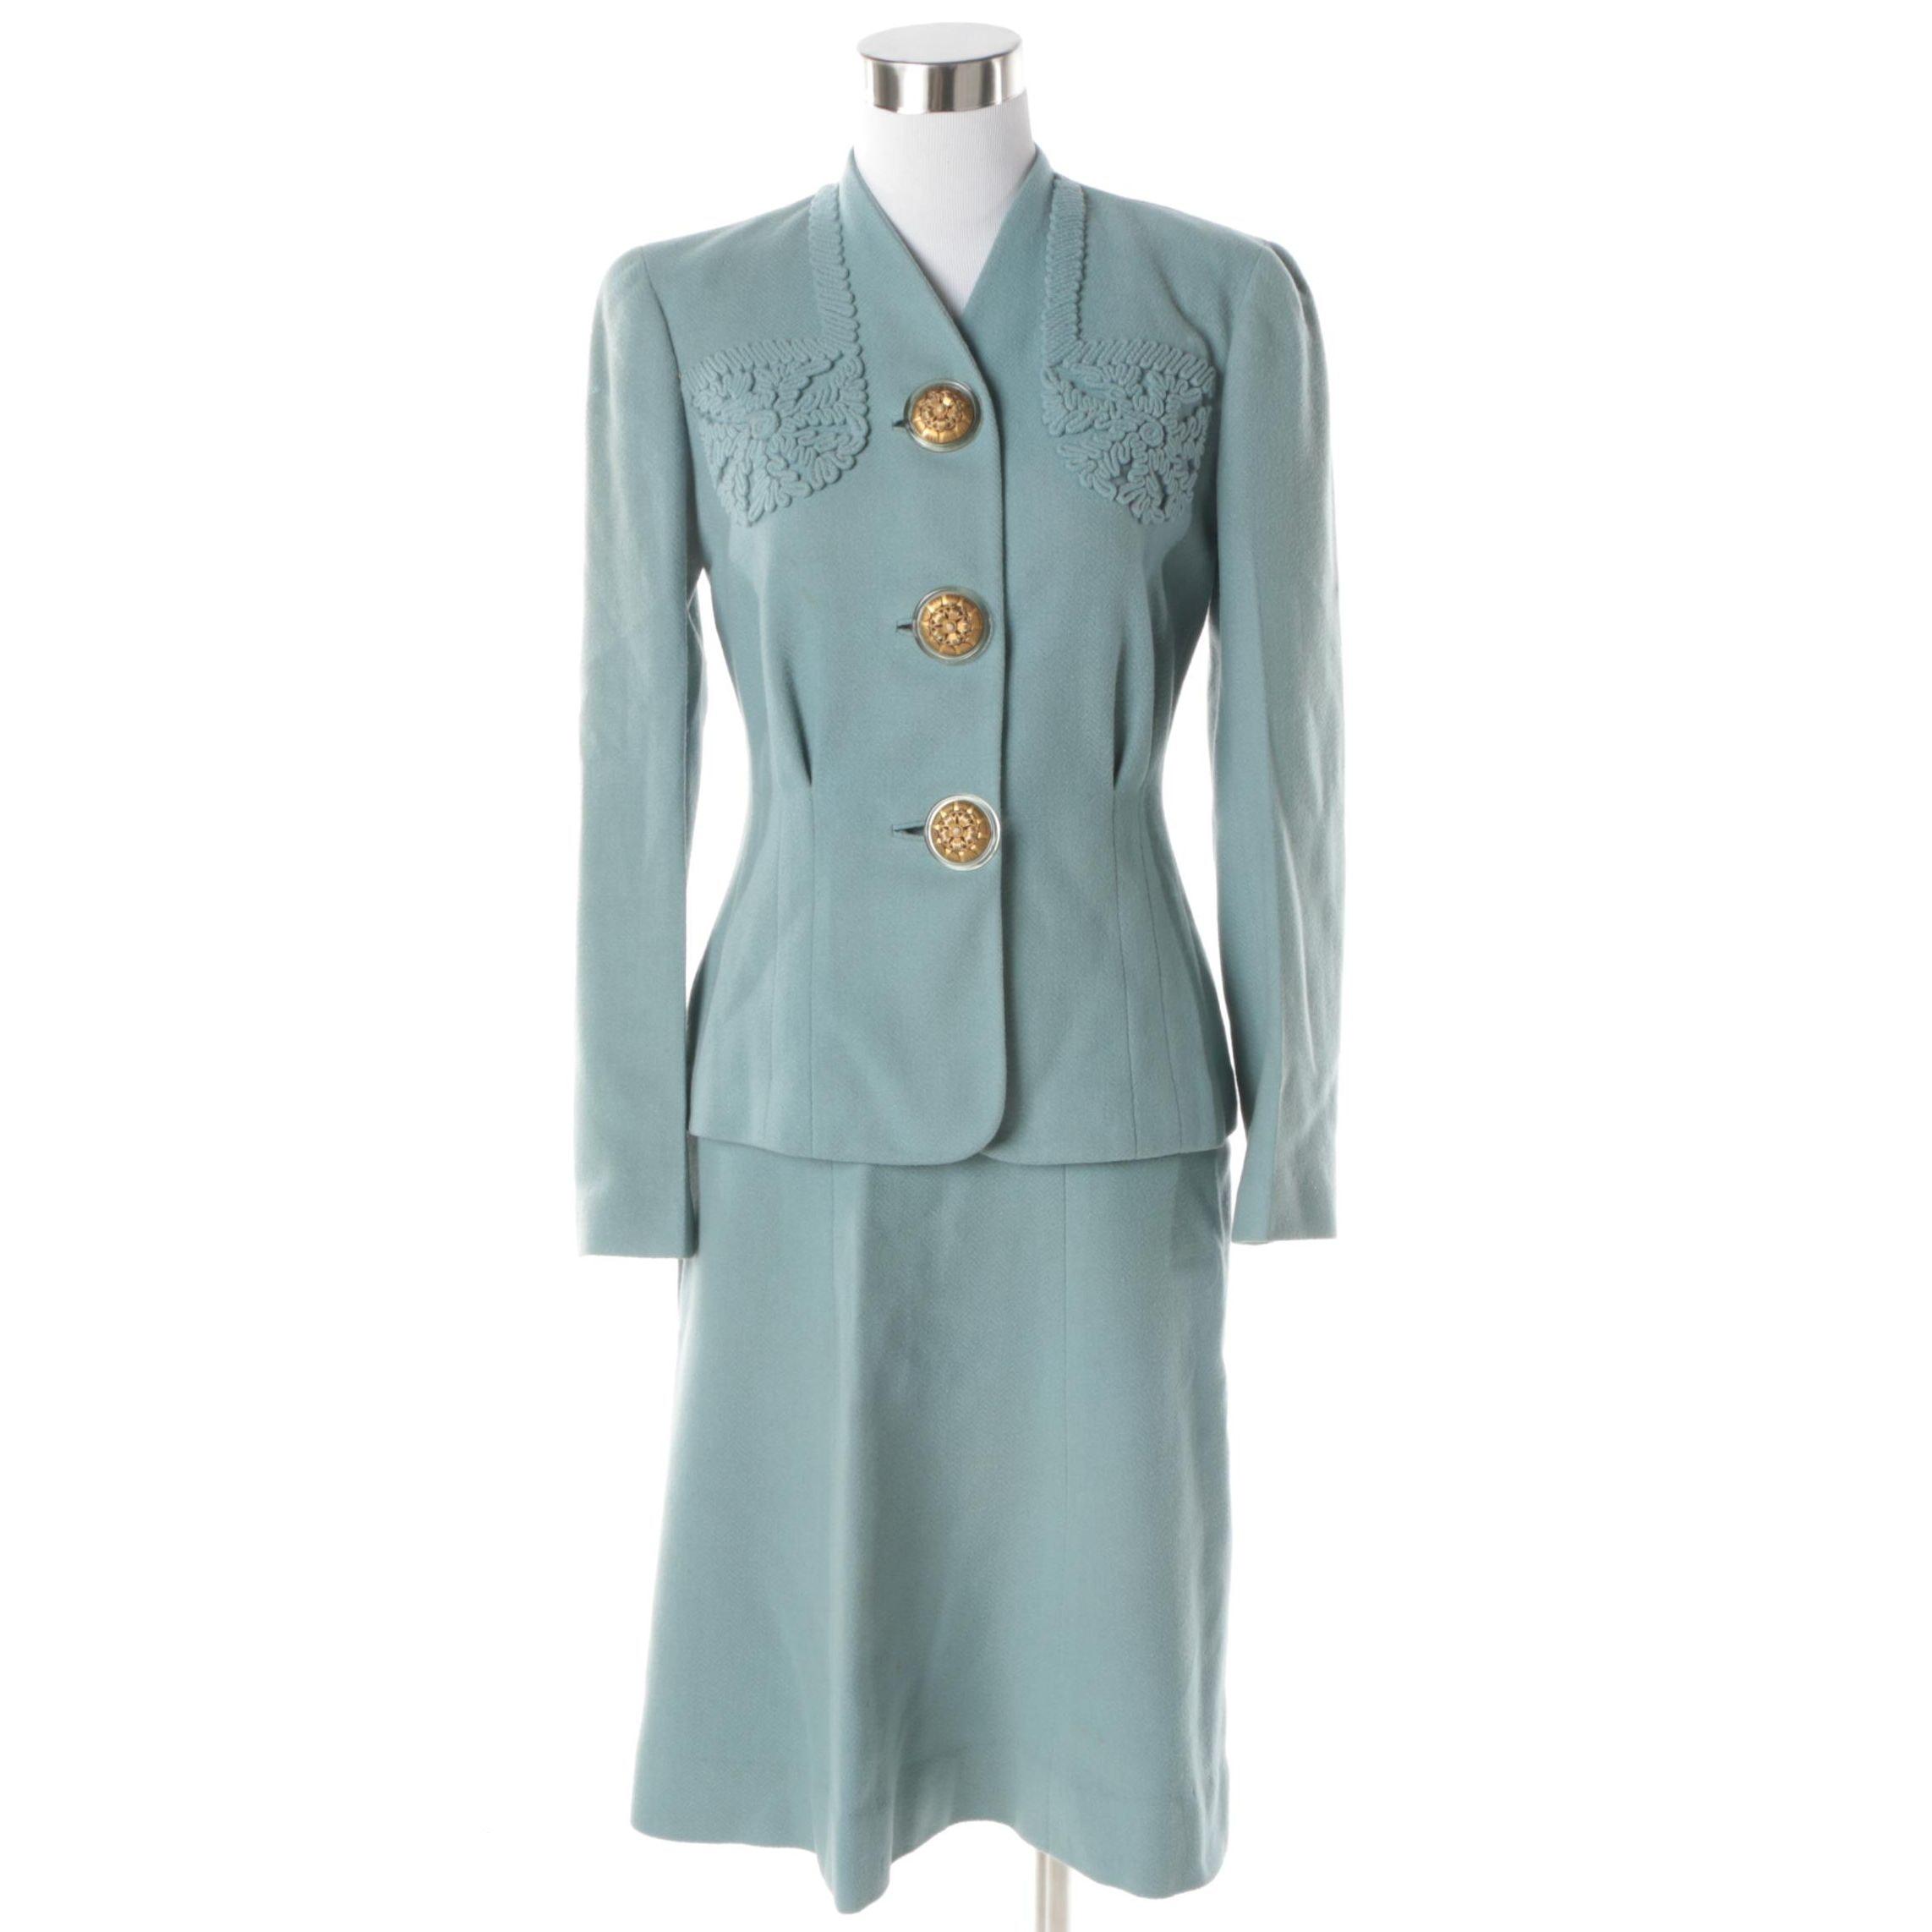 Women's Circa 1940s Vintage Light Blue Wool Skirt Suit